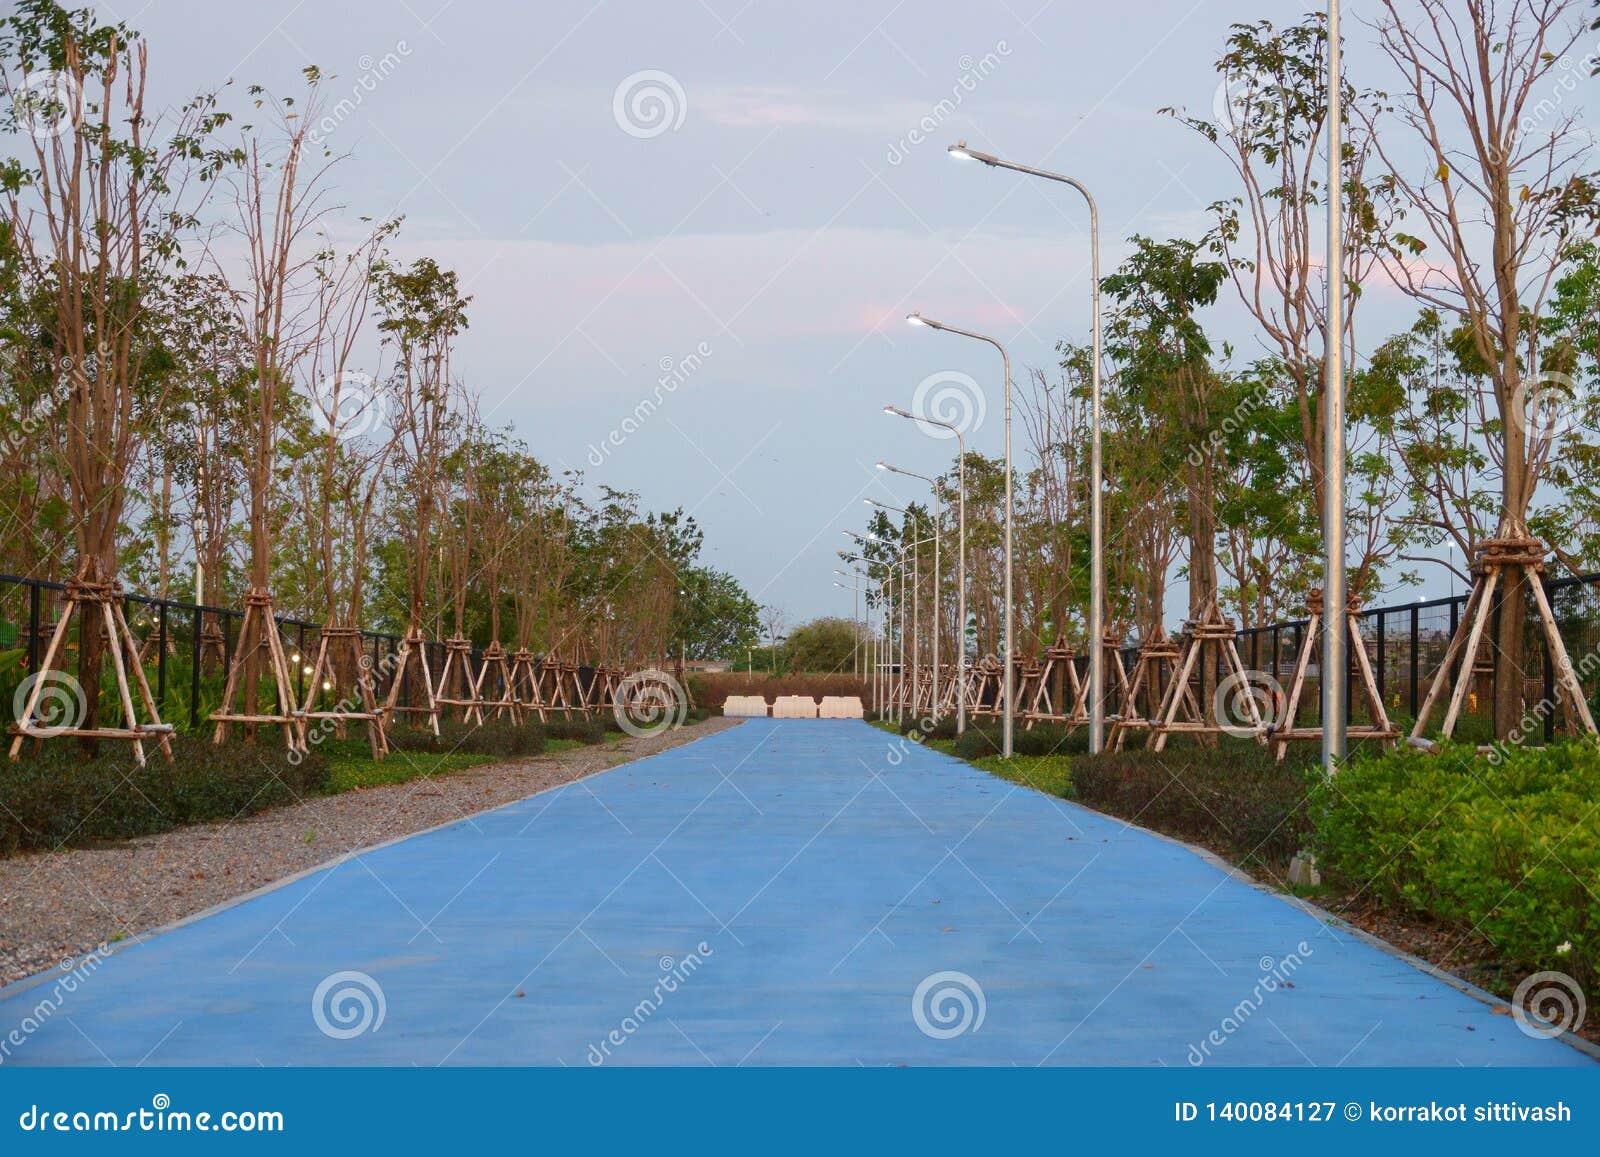 Aéroport de Suvarnabhumi, Samut Prakan, Thaïlande 17 février 2019 : piste cyclable